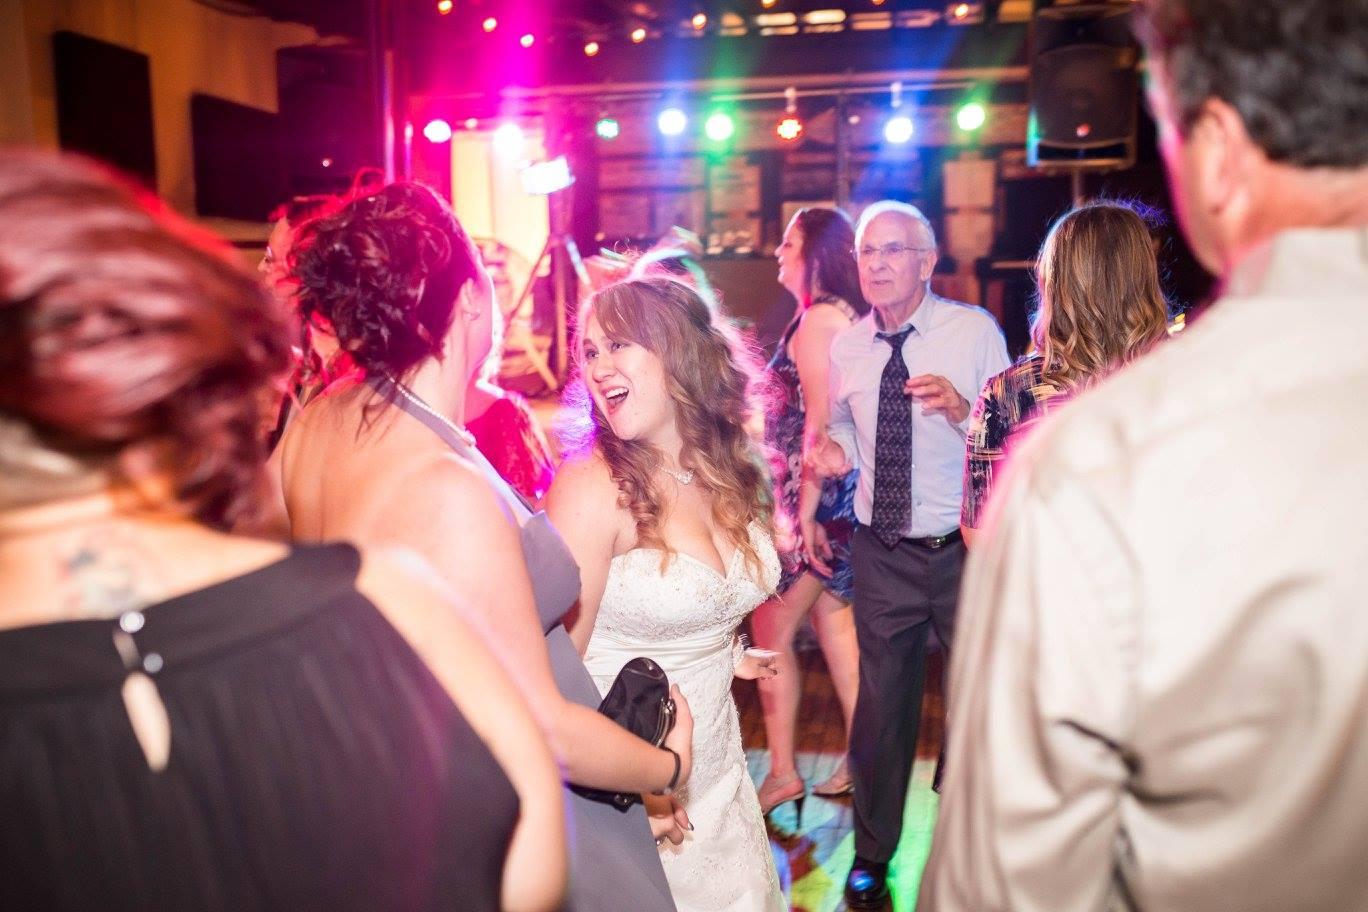 Wedding DJ Prices in Milwaukee - Affordable Wedding DJ in Milwaukee